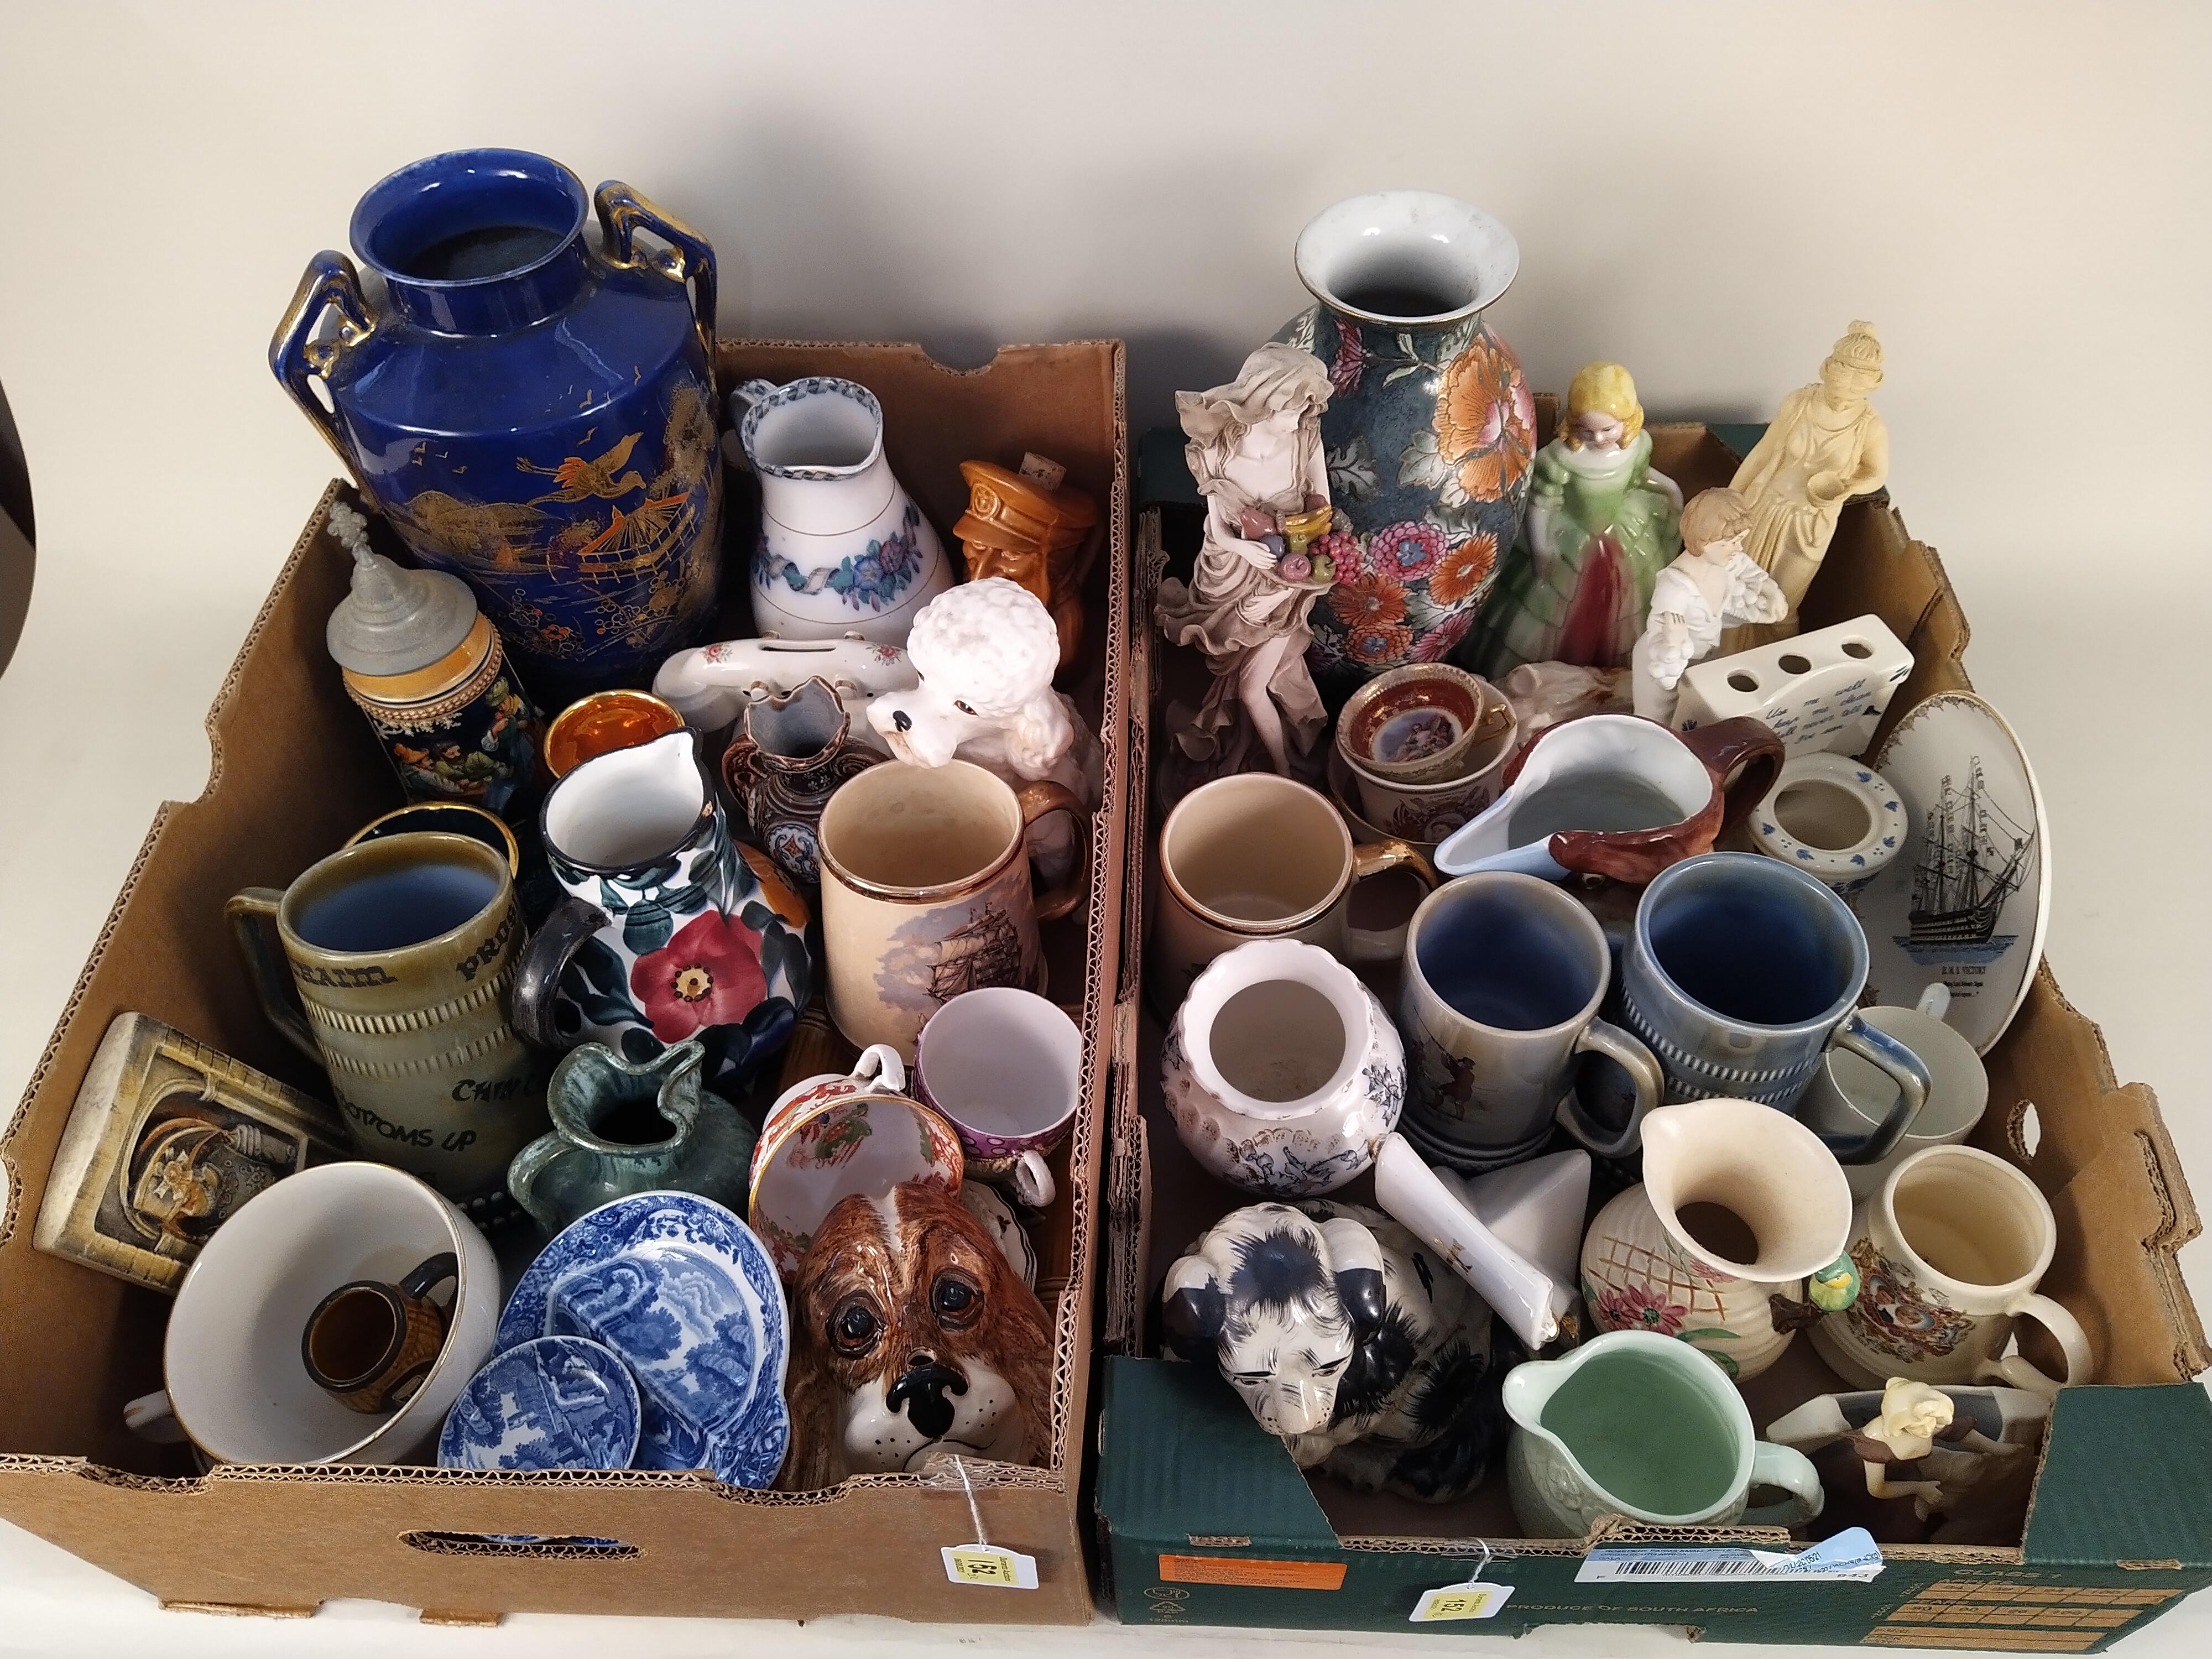 Mixed ceramics including figurines, vases, - Image 3 of 3